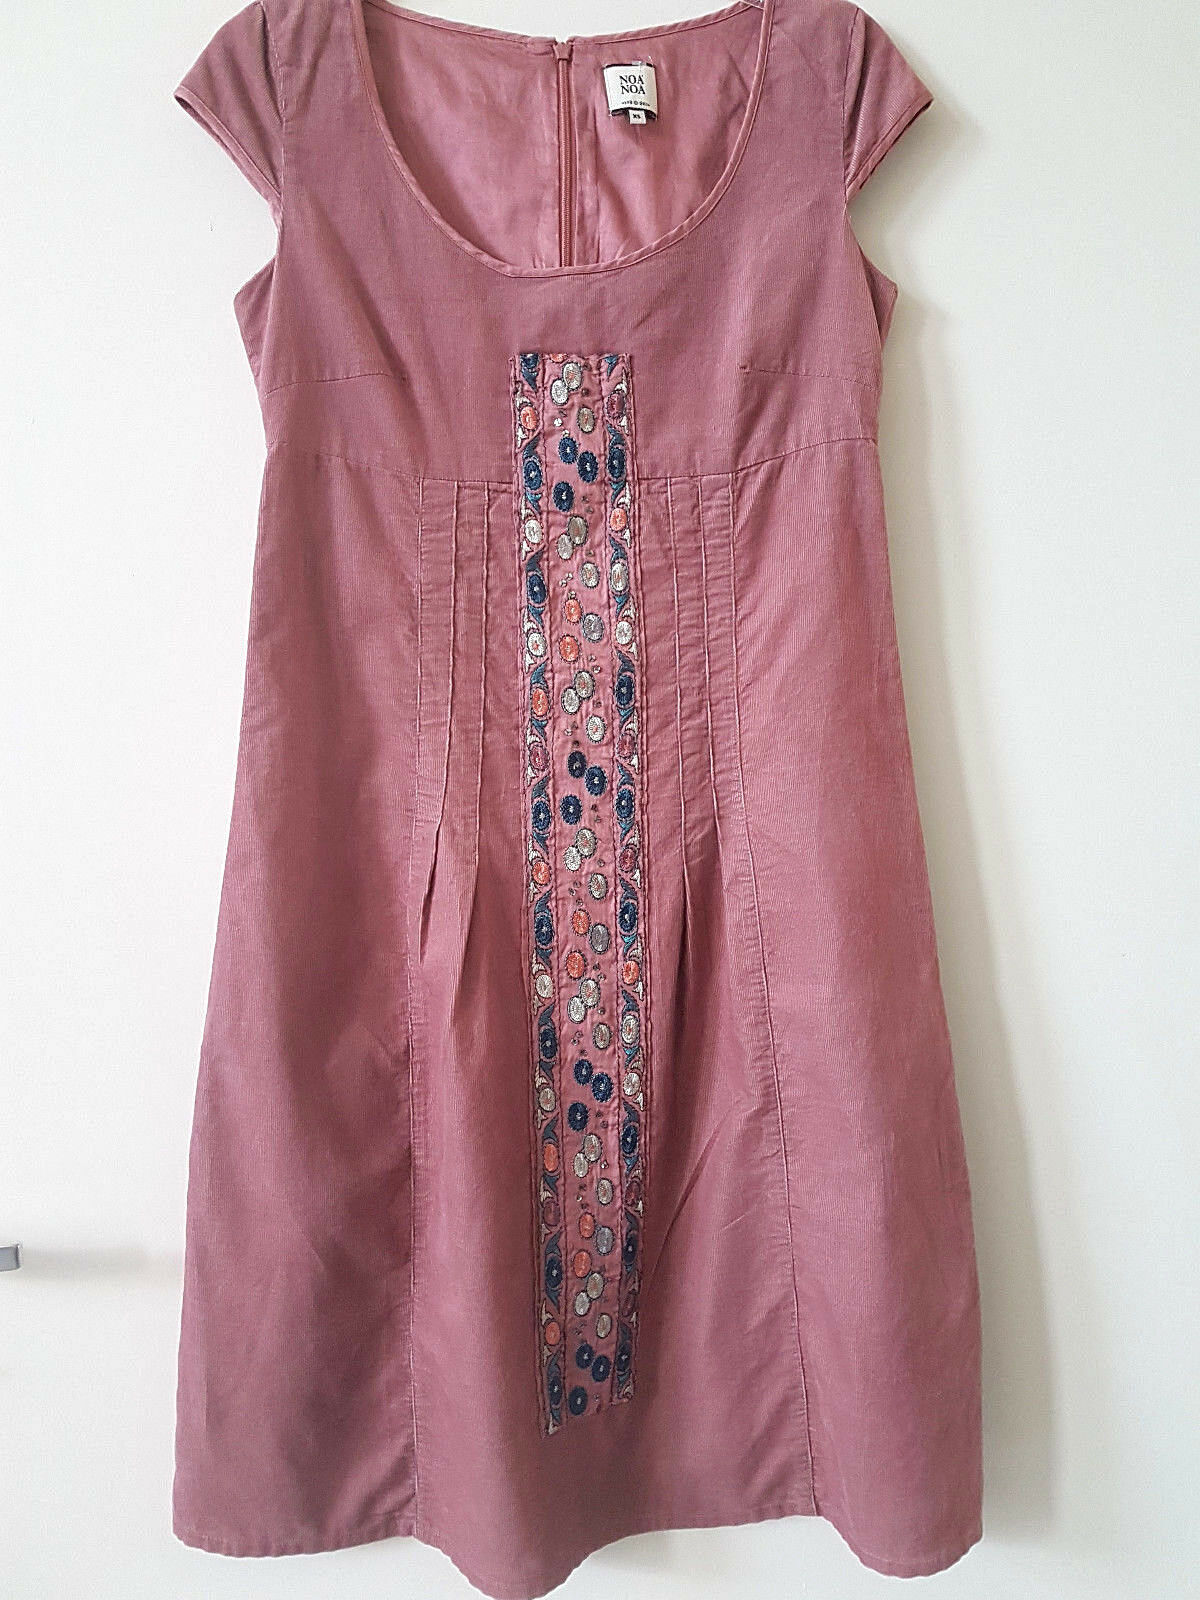 NOA NOA elegantes Kleid für Büro Empfang Stickereien Gr. XS 100 % Cotton   G195